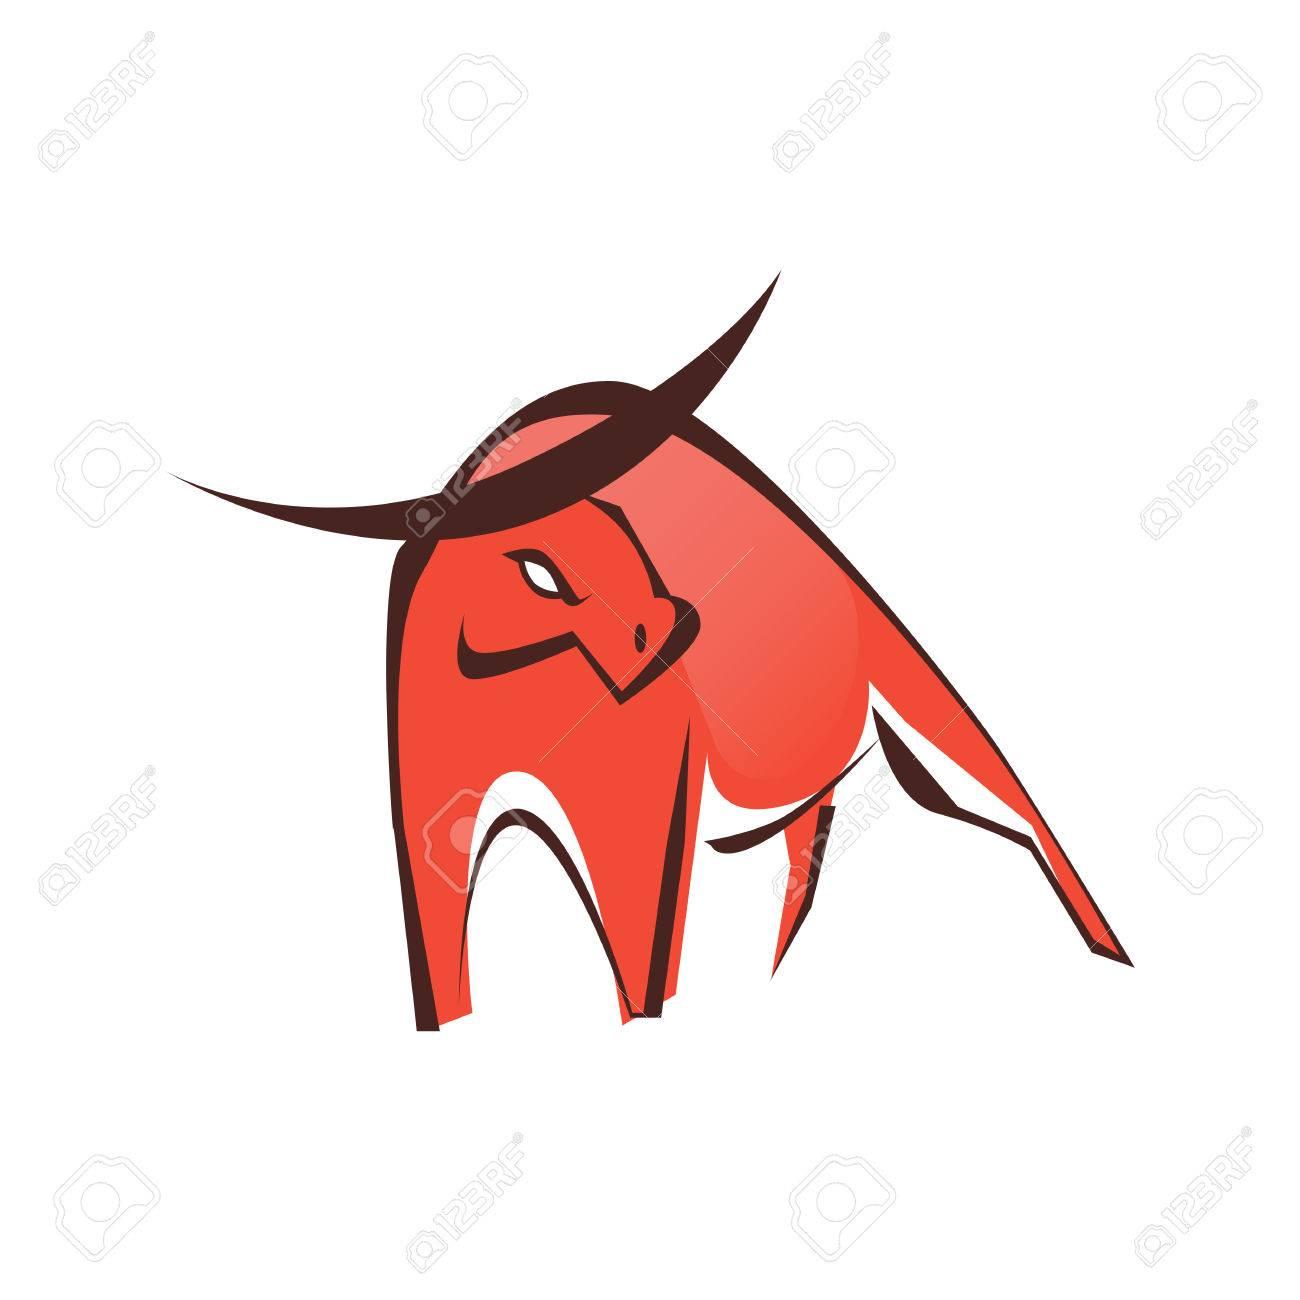 stylish red bull logo symbol royalty free cliparts vectors and